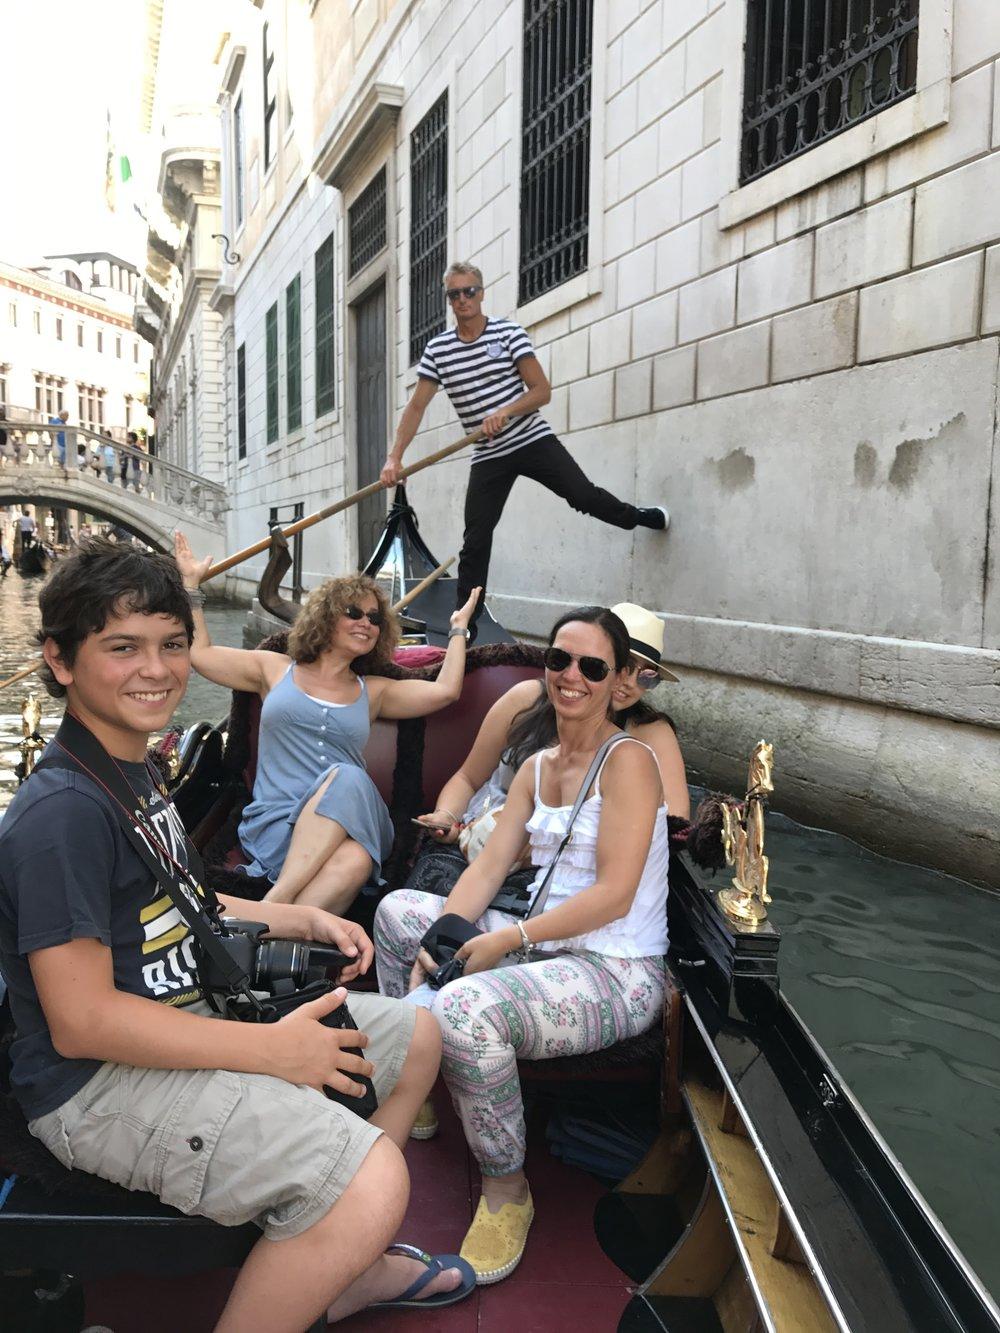 VeniceGondolierAtWallIMG_4388.JPG